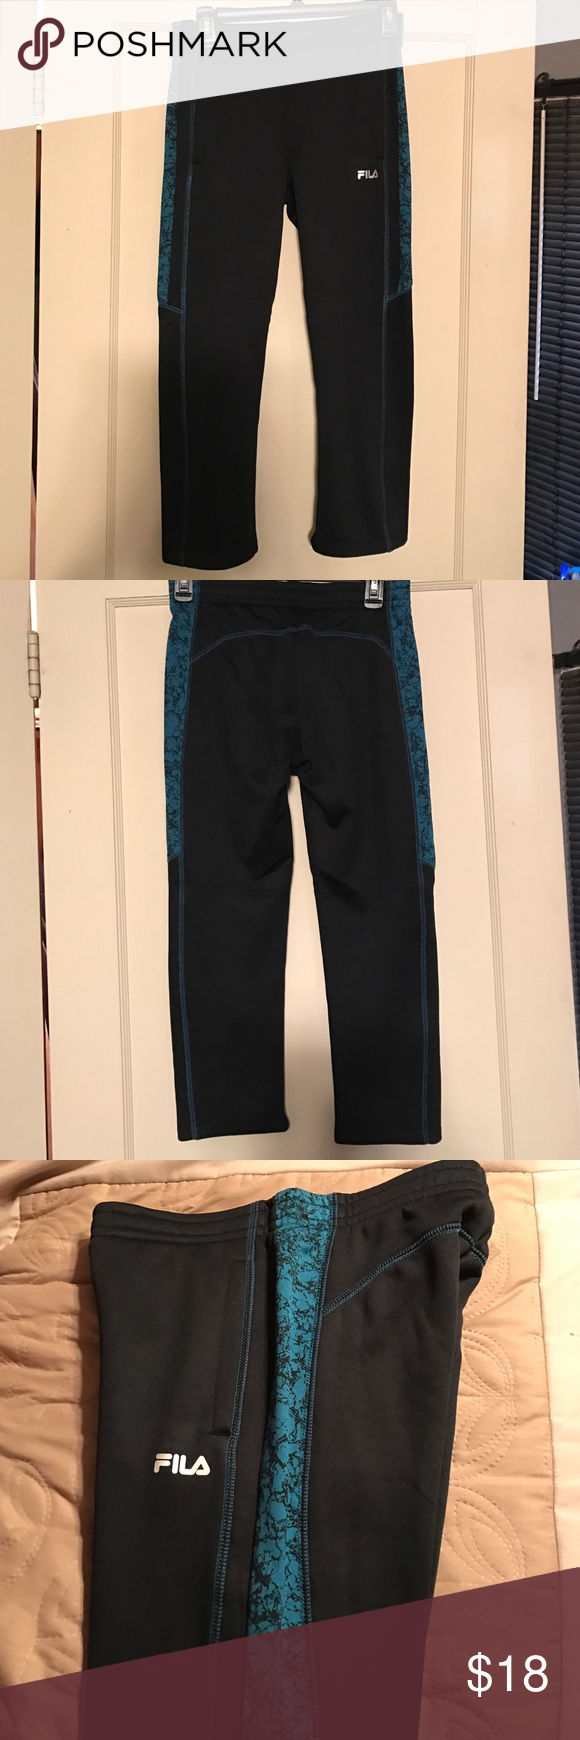 Fila pants NWT Boys Fila pants adjustable draw string waist Fila Bottoms Sweatpants & Joggers